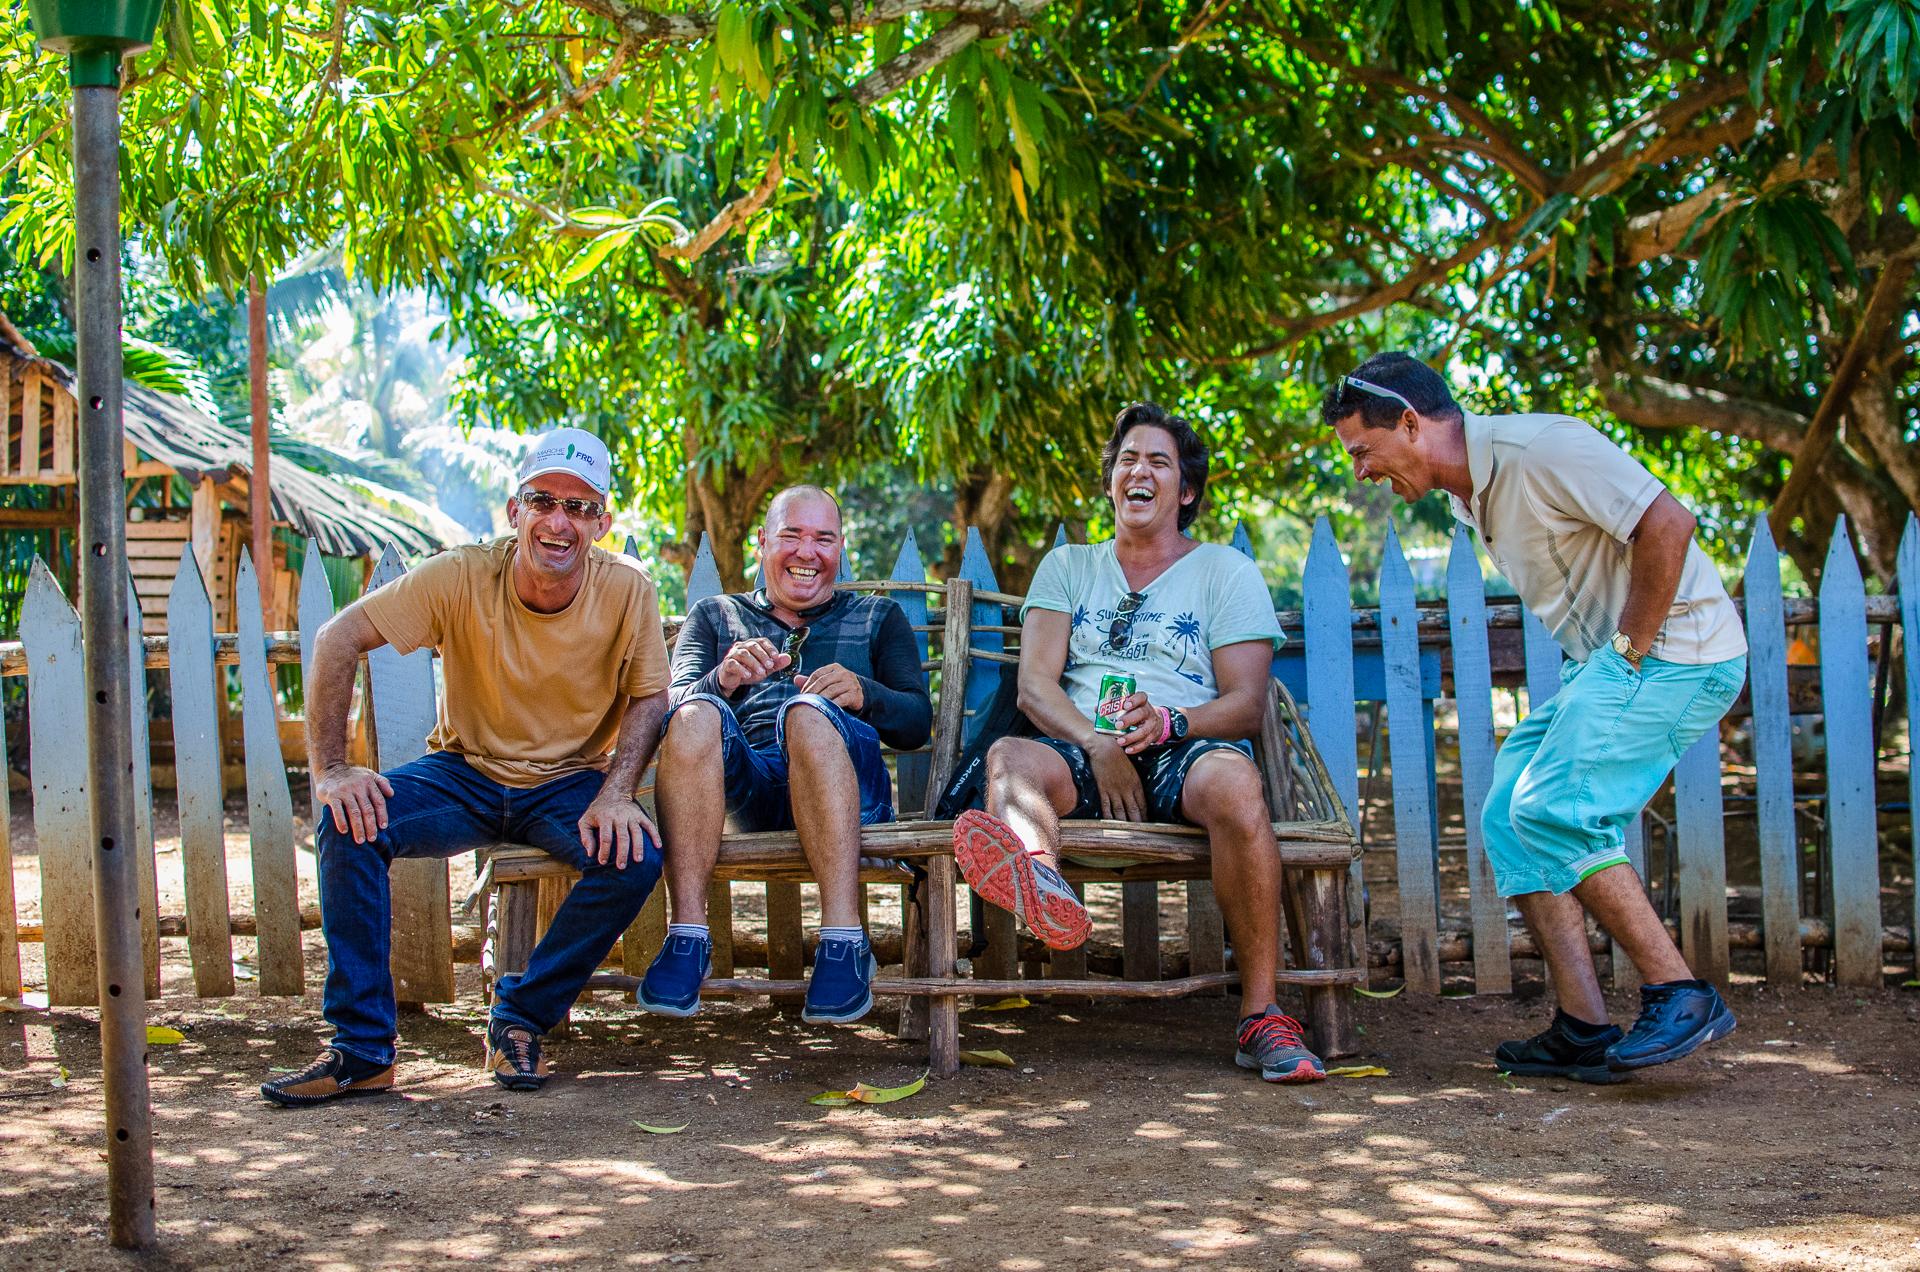 Fiesta Cubaine chez Shandy, Holguin, Cuba